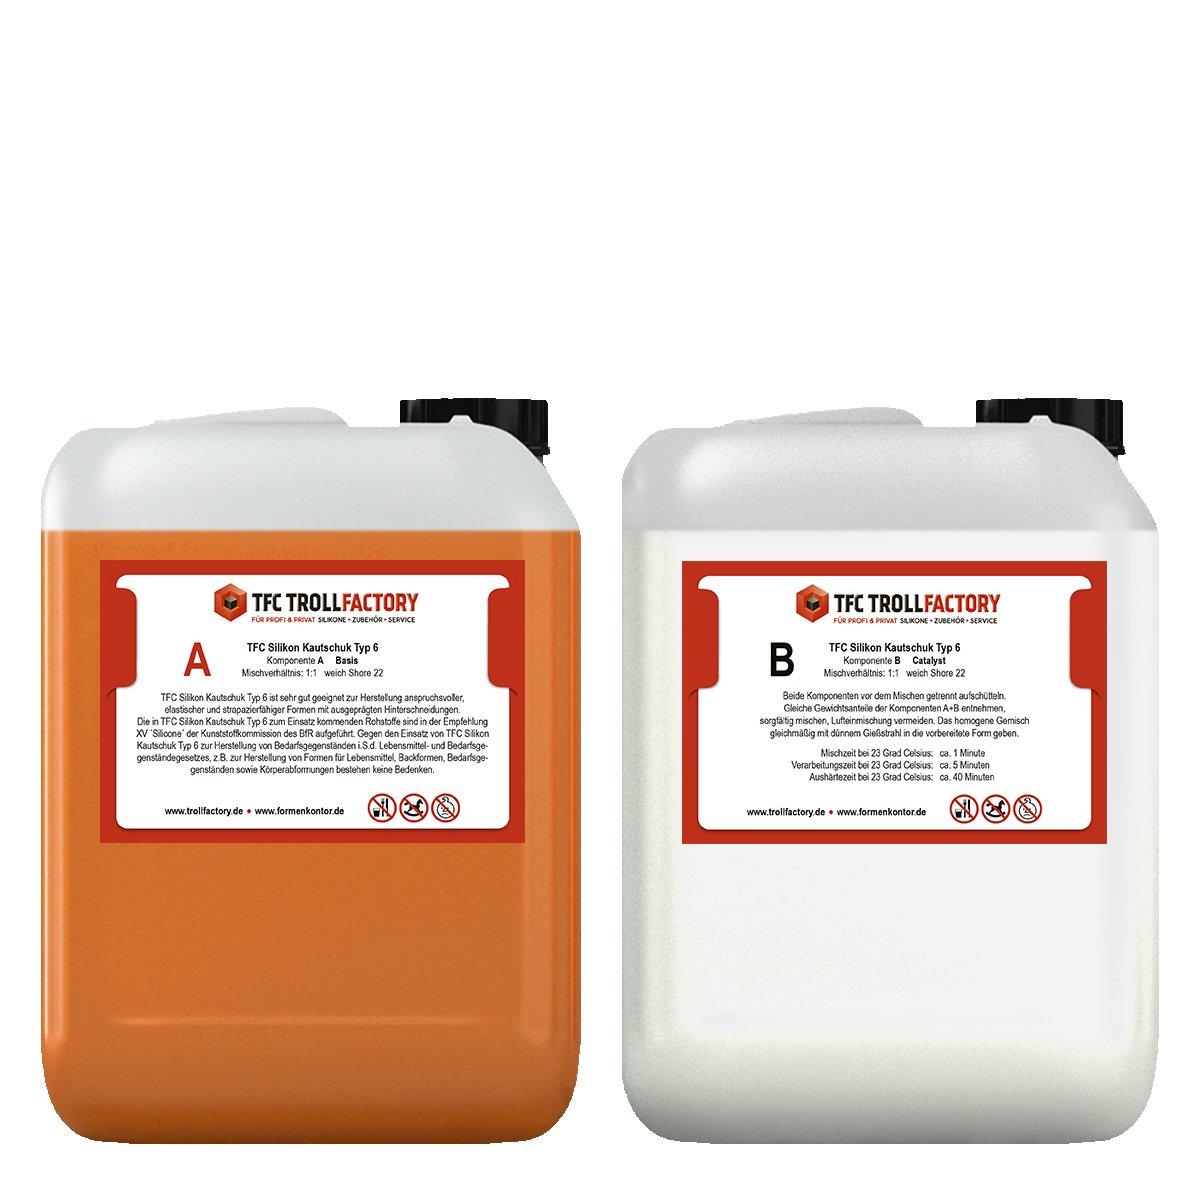 TFC Silikon Kautschuk Typ 6 I Dubliersilikon lebensmittelecht I weich, 500 g (2 x 250 g) TFC Troll Factory